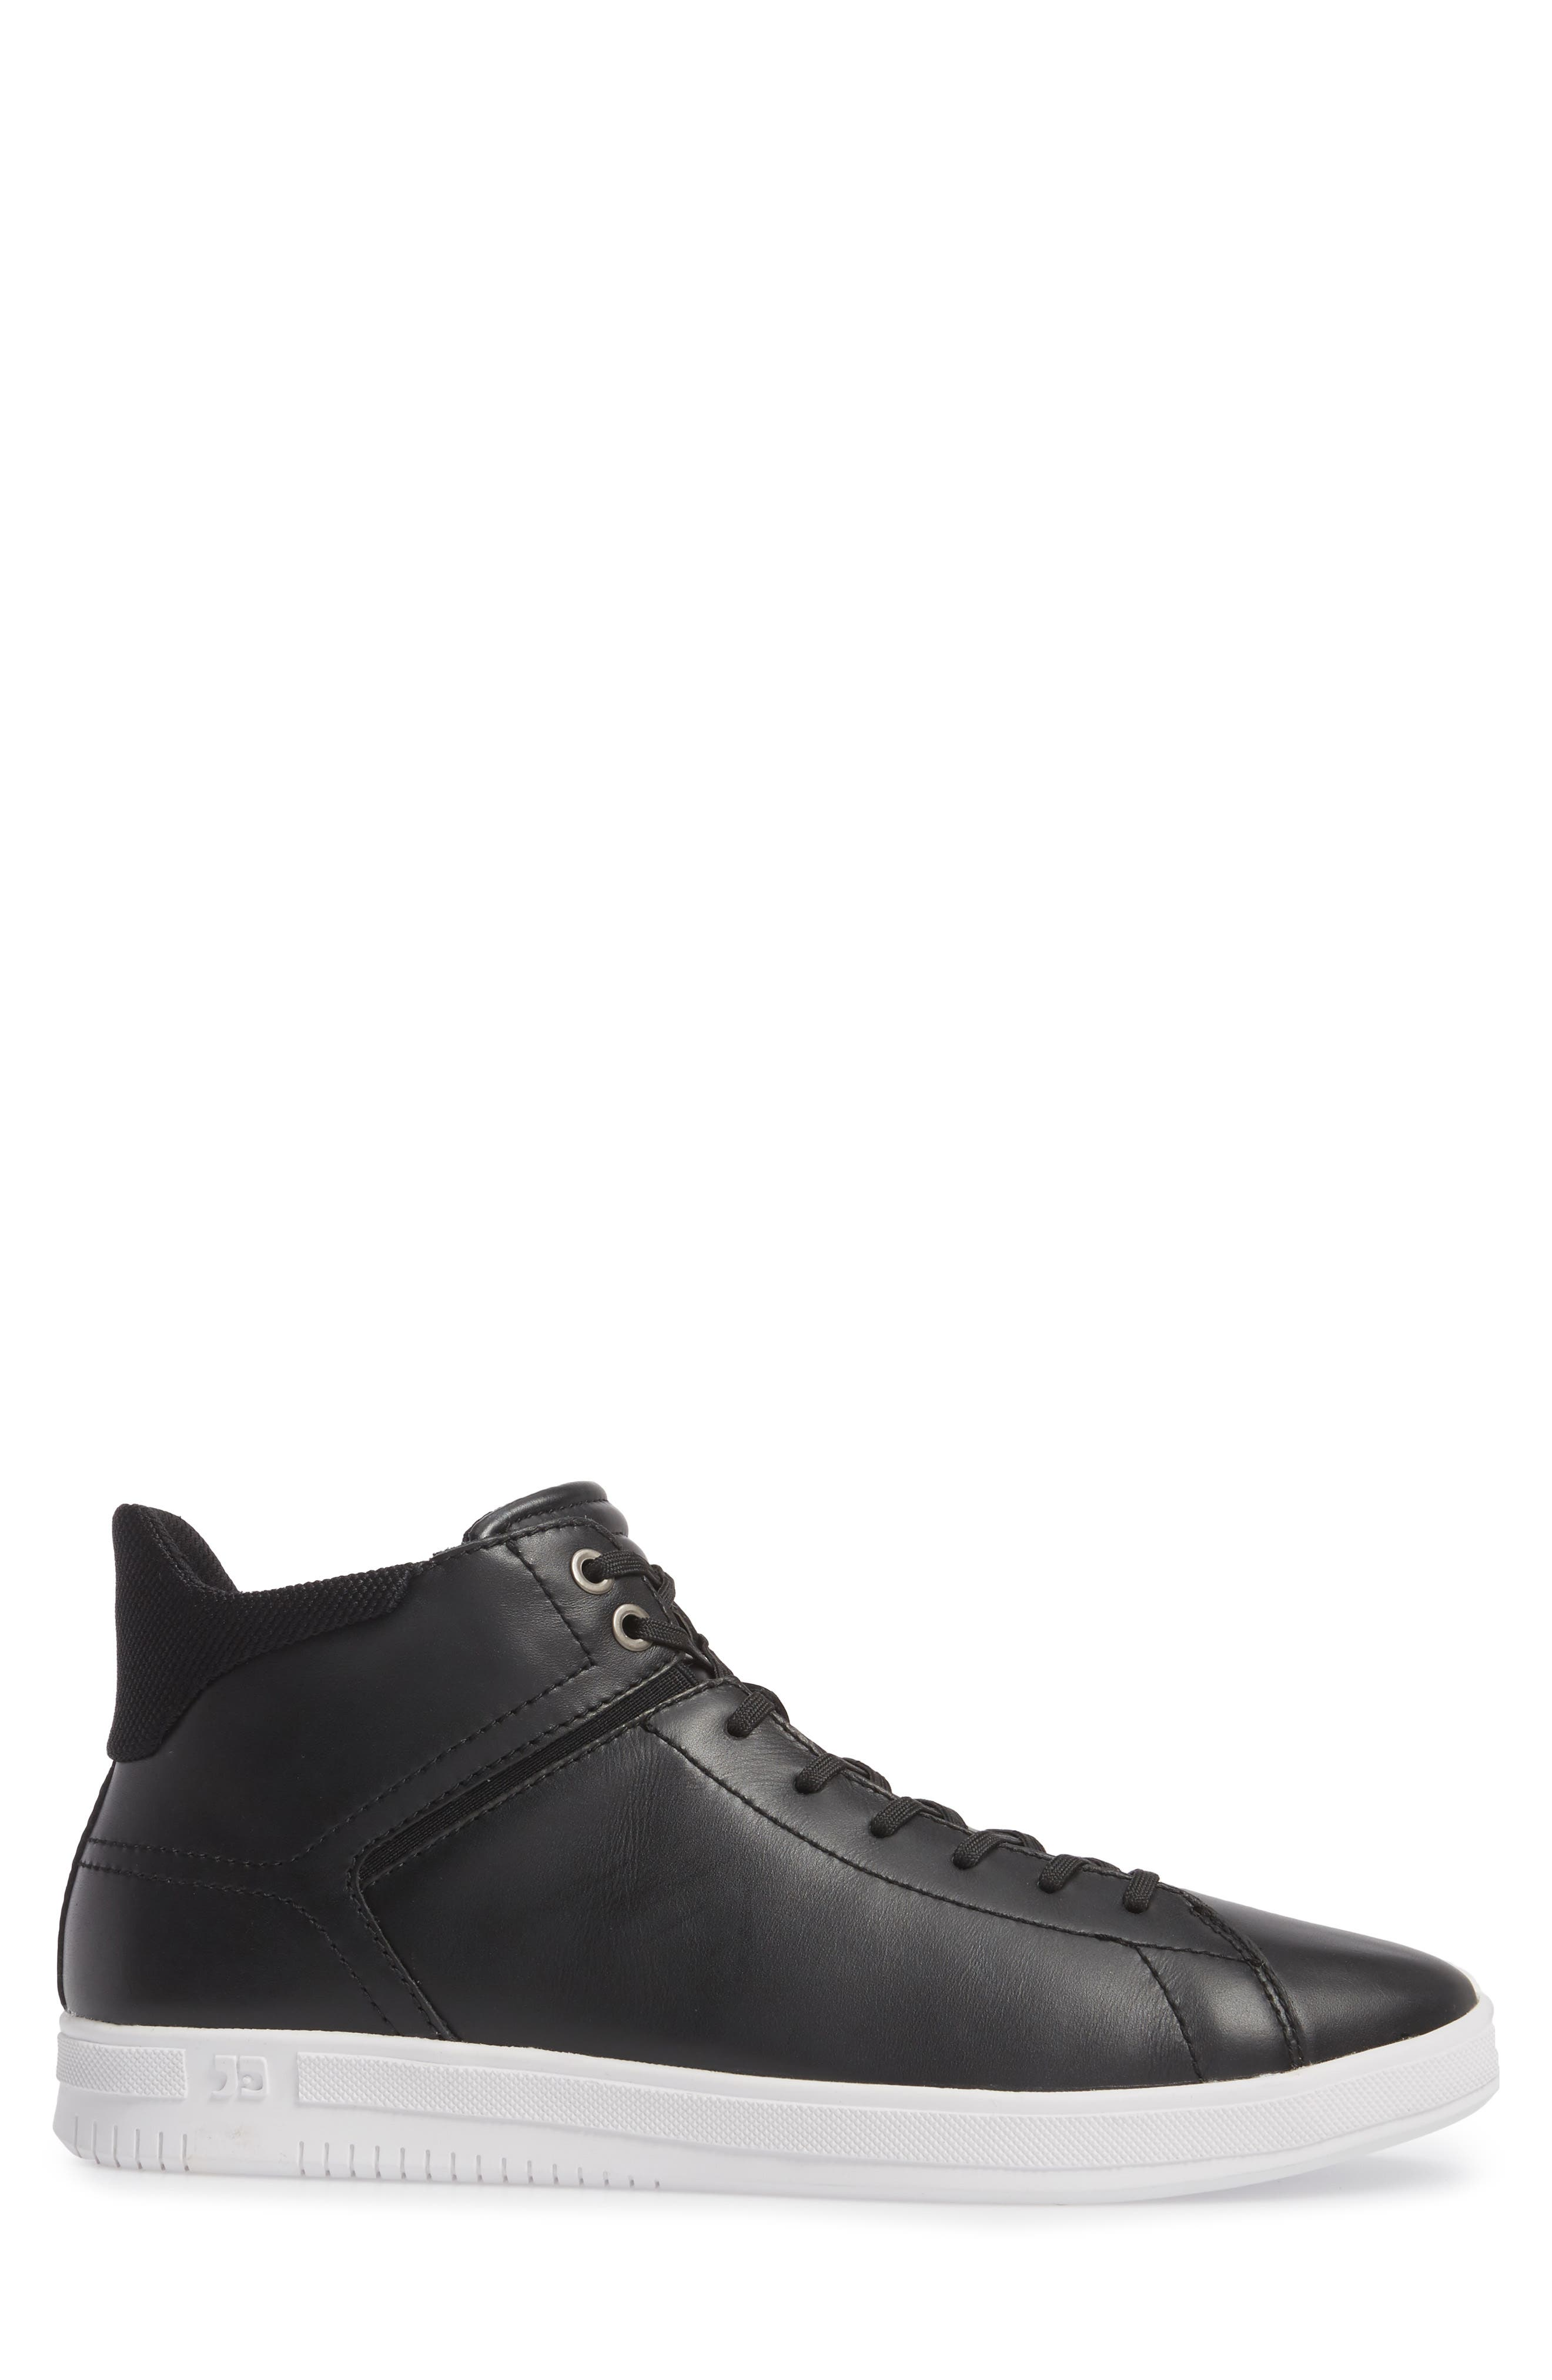 Joe Z Mid Top Sneaker,                             Alternate thumbnail 3, color,                             Black Leather